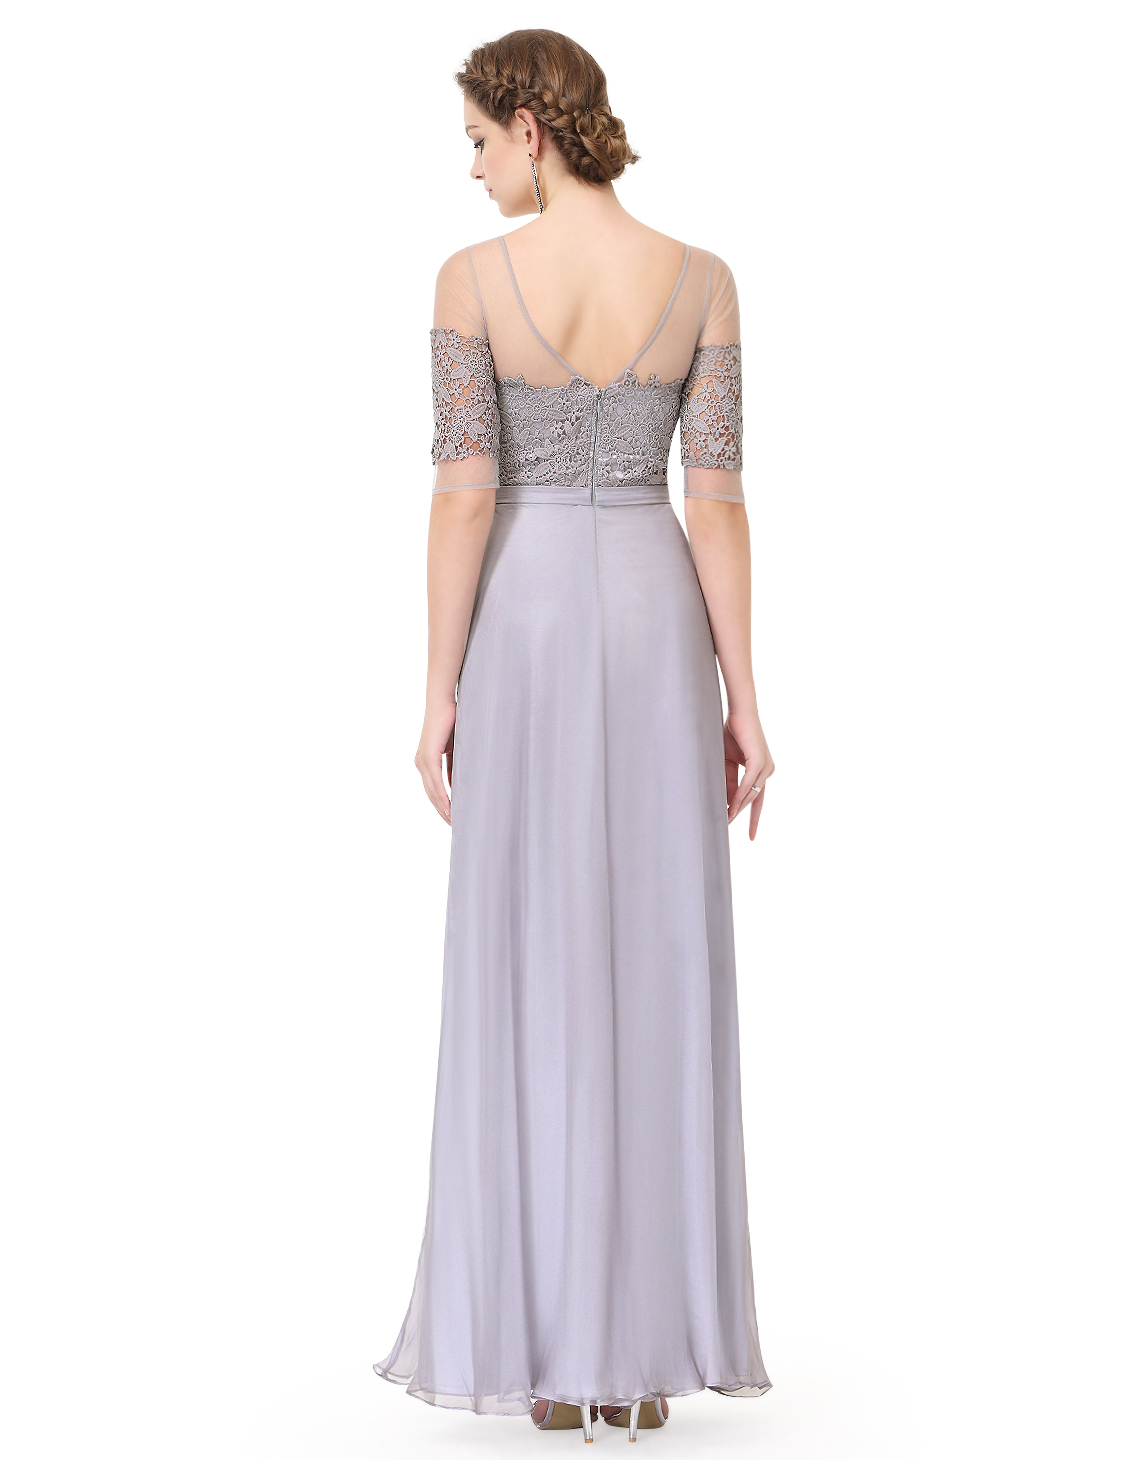 Long half sleeve bridesmaid wedding dress cocktail prom for Half sleeve wedding dress